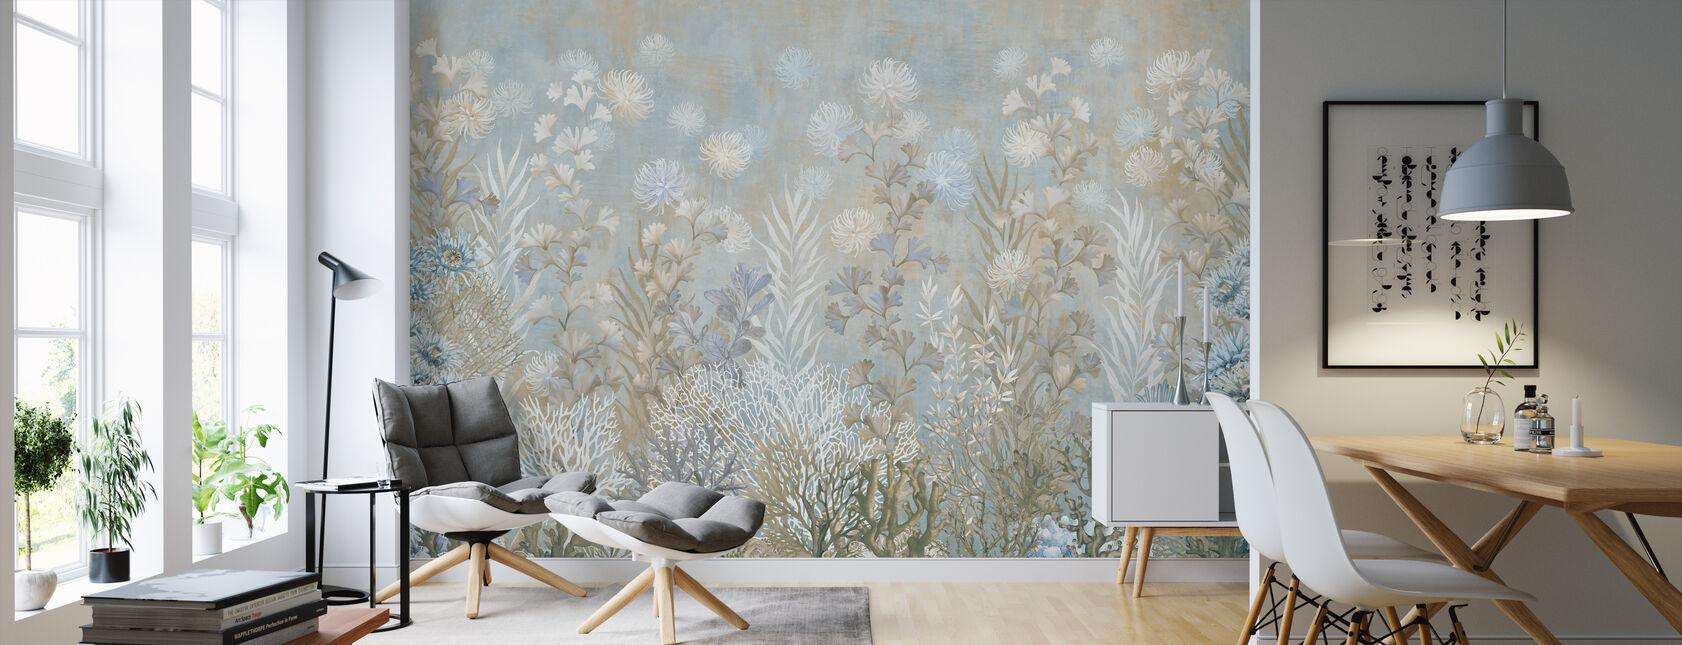 Marine Garden - Wallpaper - Living Room